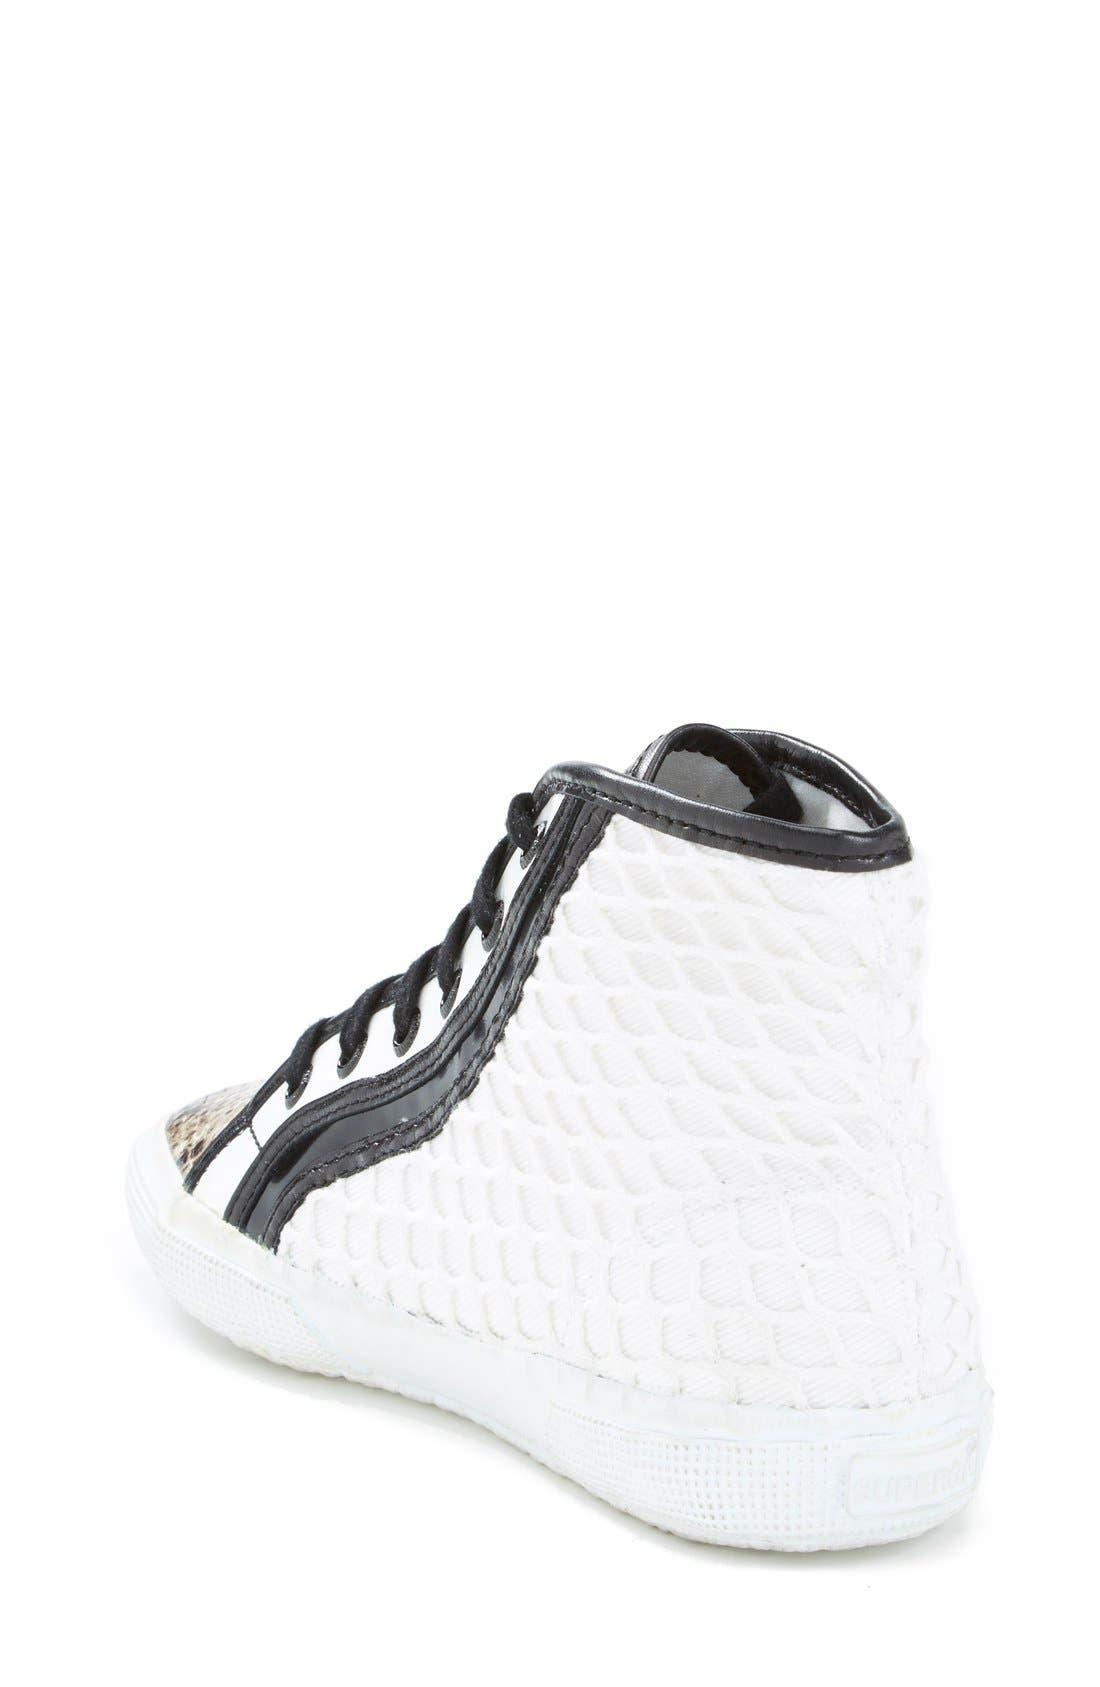 Alternate Image 2  - Superga Rodarte Mixed Media High Top Sneaker (Women)